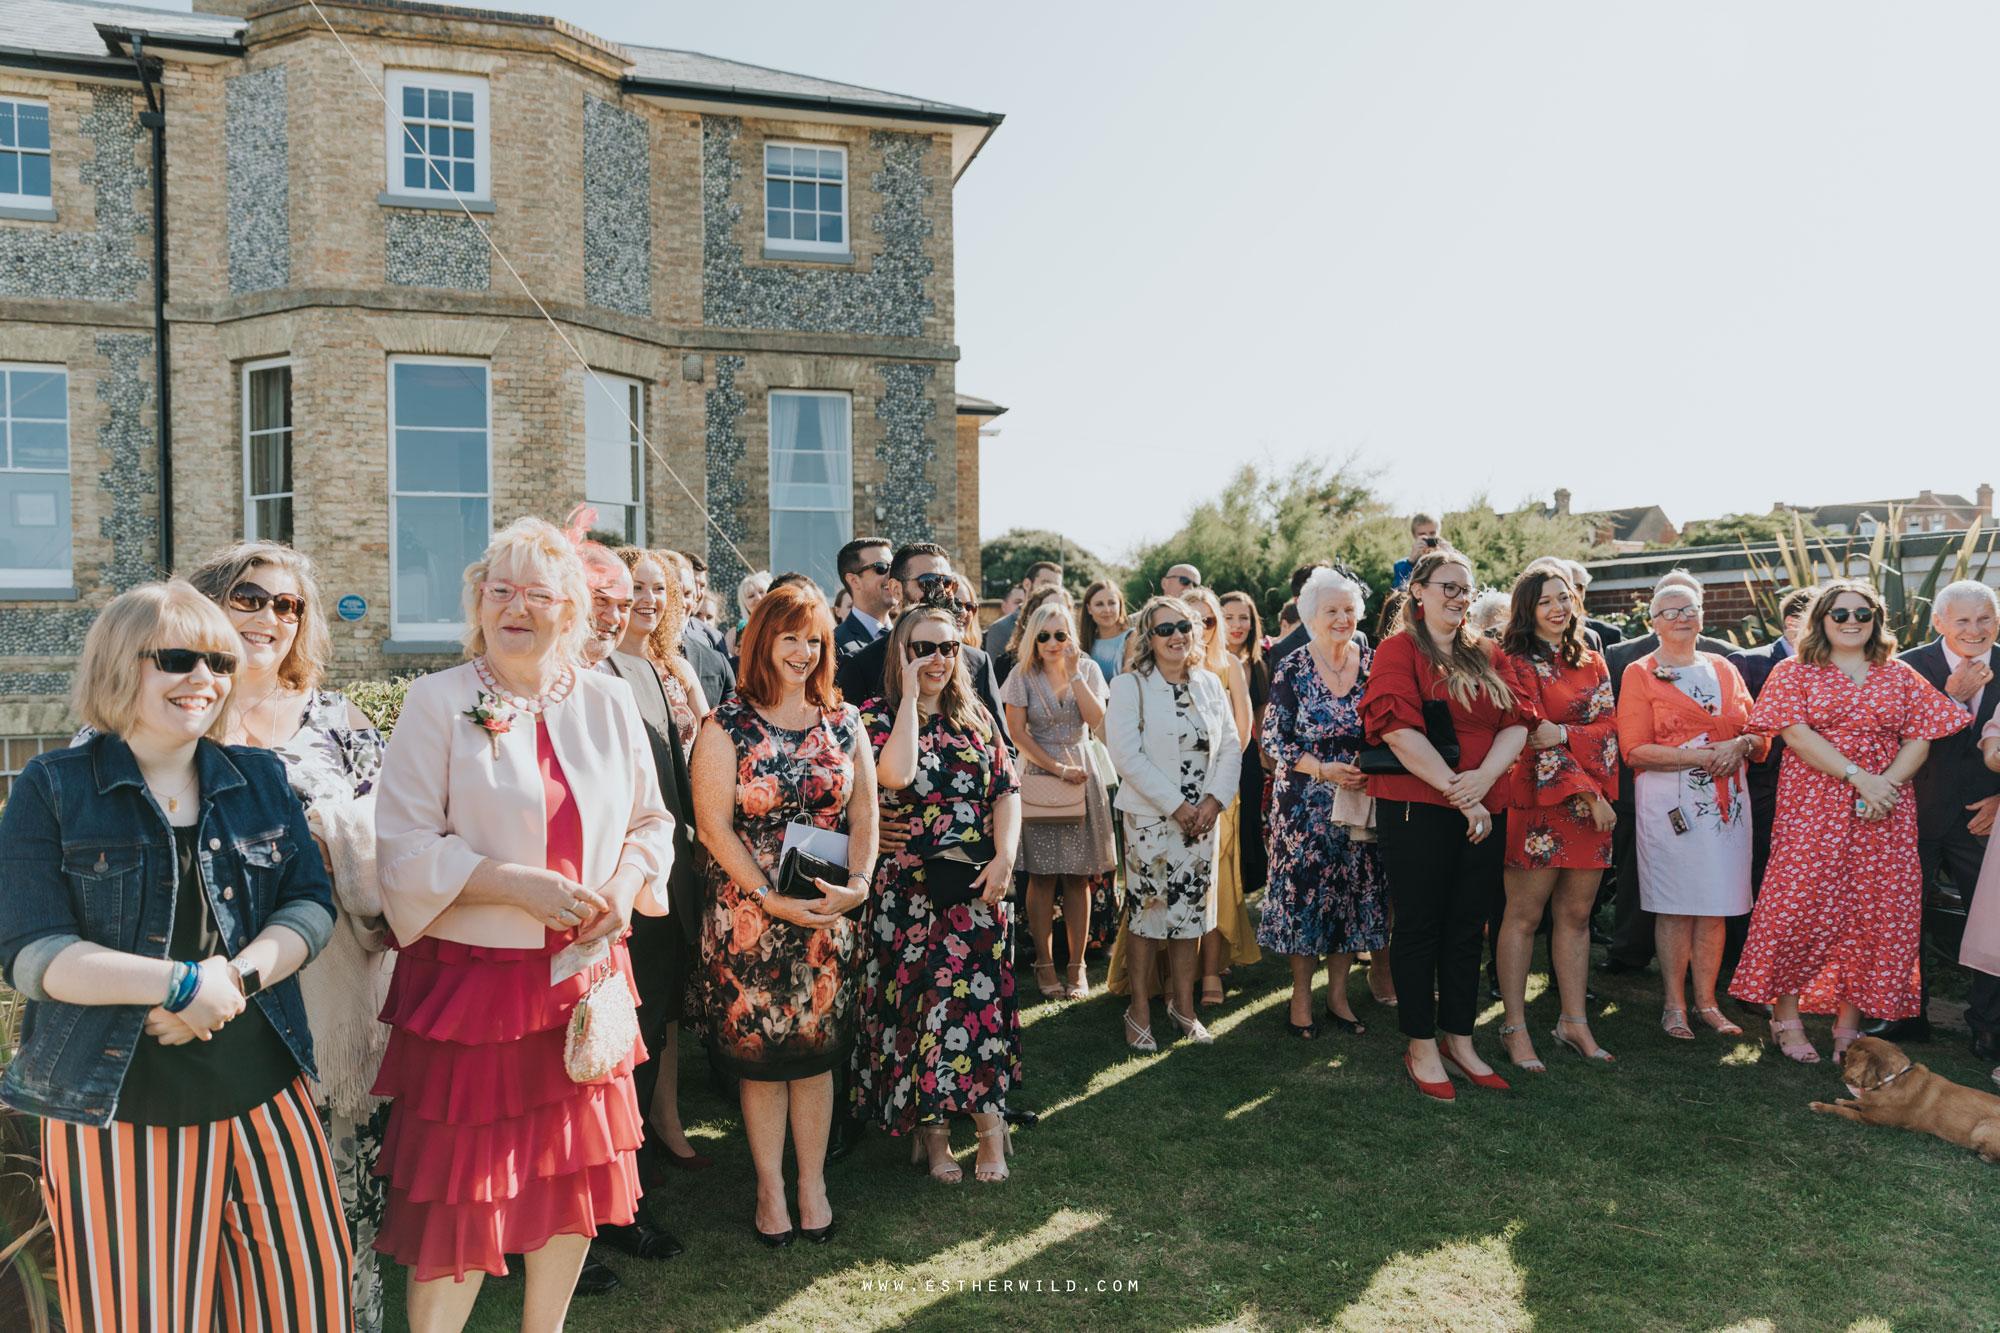 Cromer_Wedding_Beach_Outdoor_Ceremony_Norfolk_North_Lodge_Registry_Office_Rocket_House_Cafe_Cromer_Pier_IMG_3882.jpg